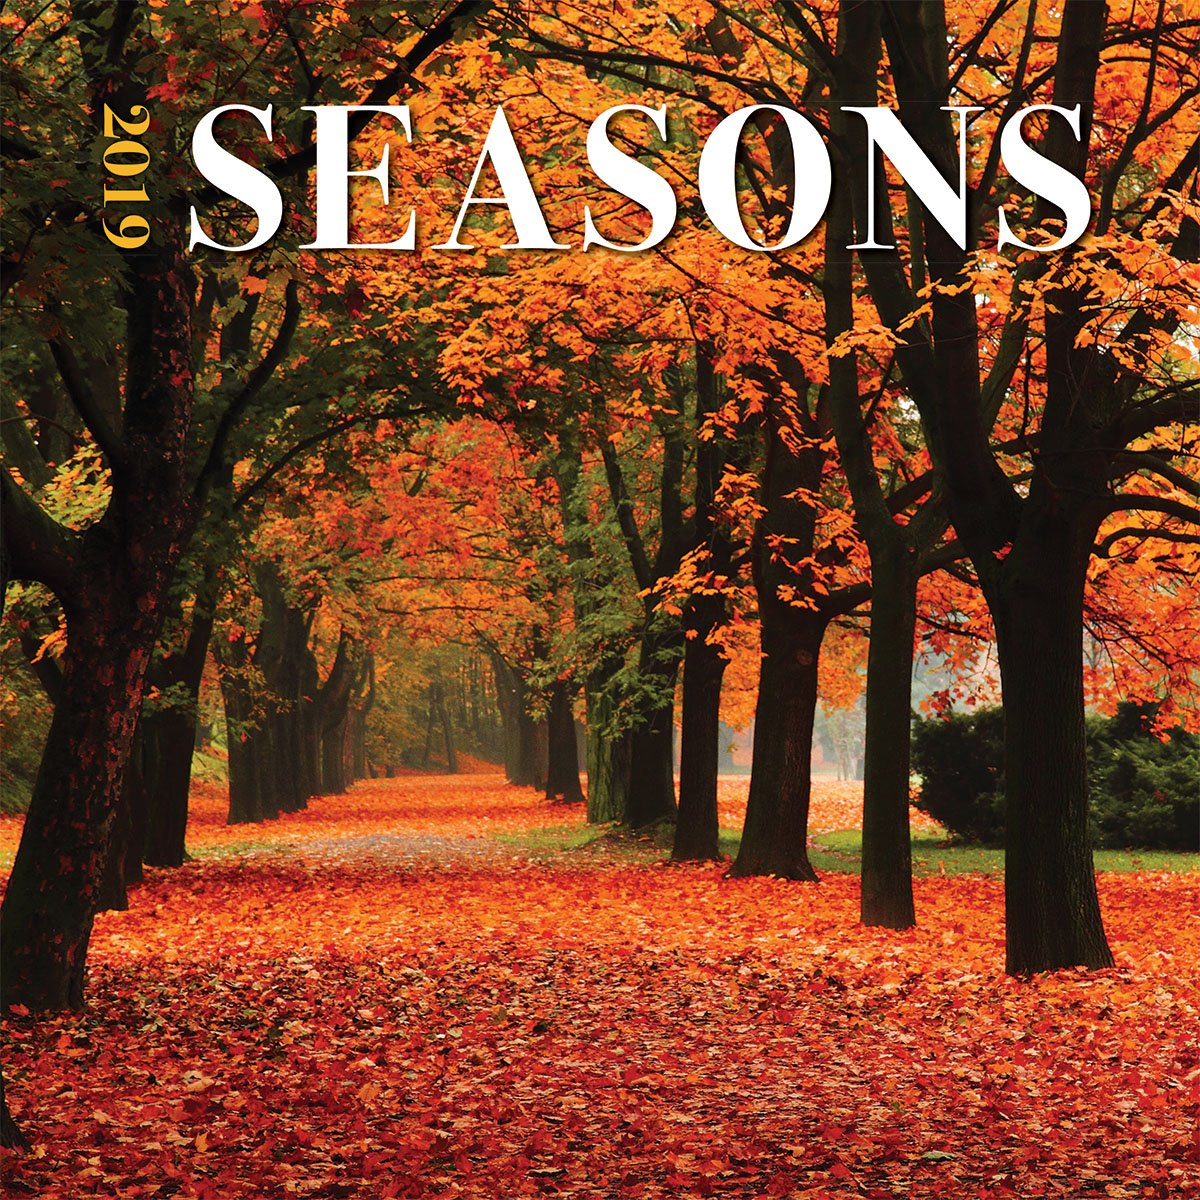 Turner Photo Seasons 2019 Wall Calendar (199989400500 Office Wall Calendar (19998940050)